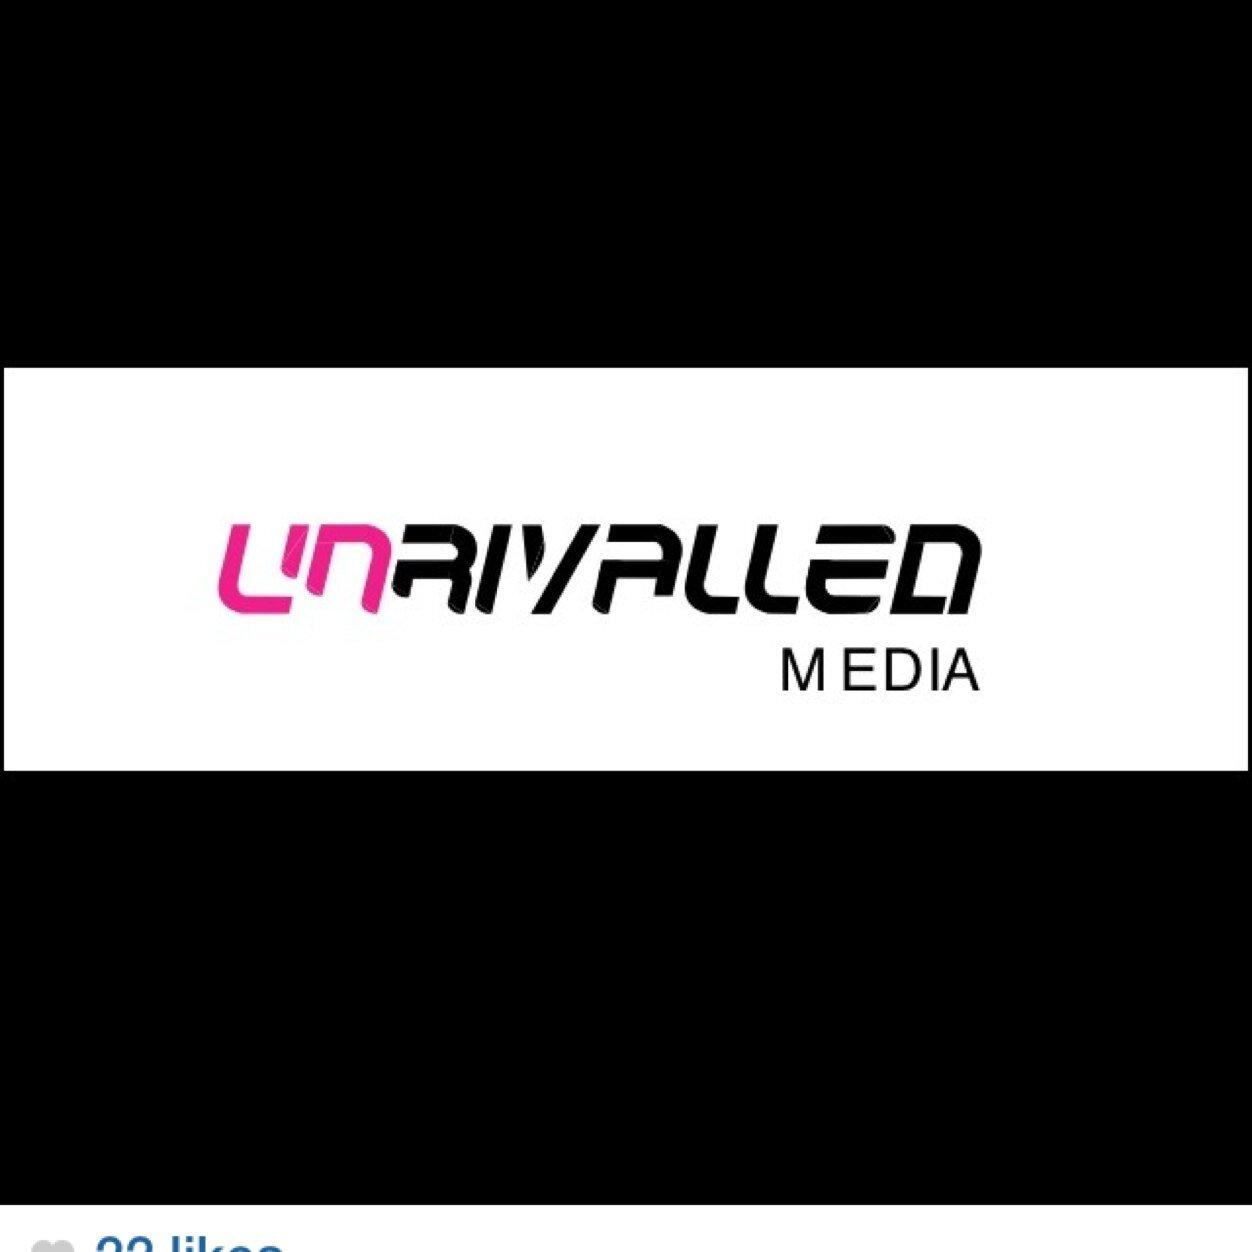 Unrivalled Media